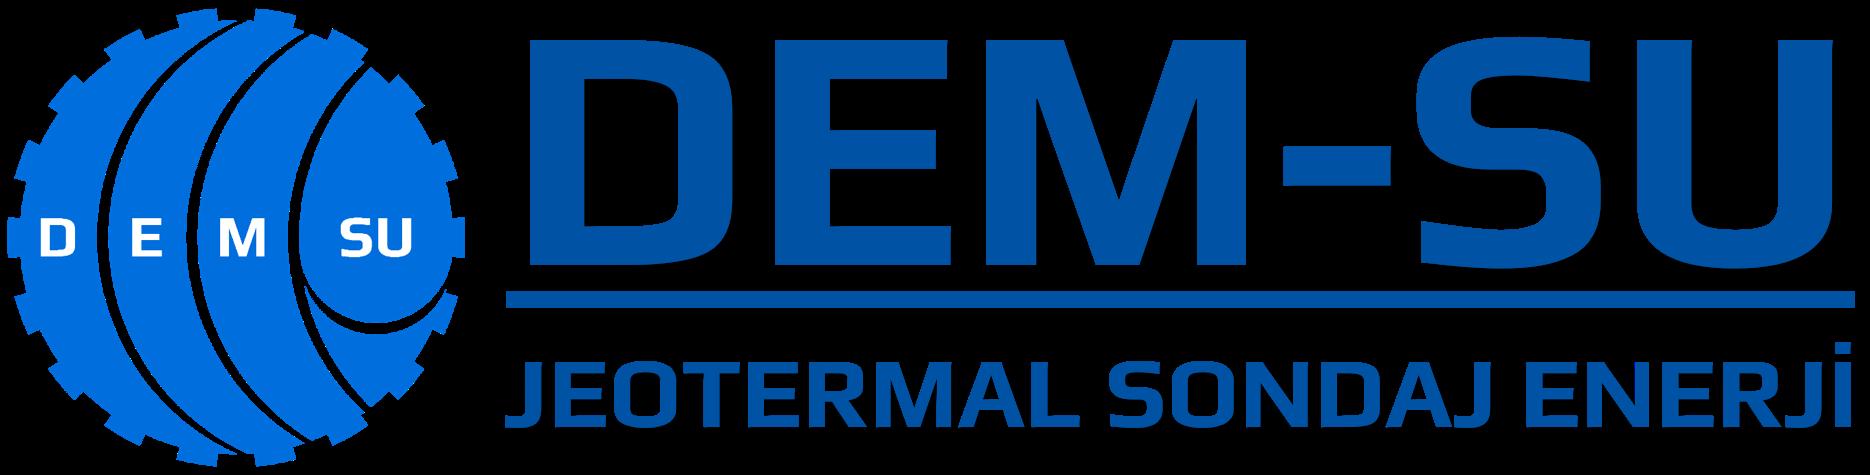 DEM-SU Jeotermal Sondaj Enerji